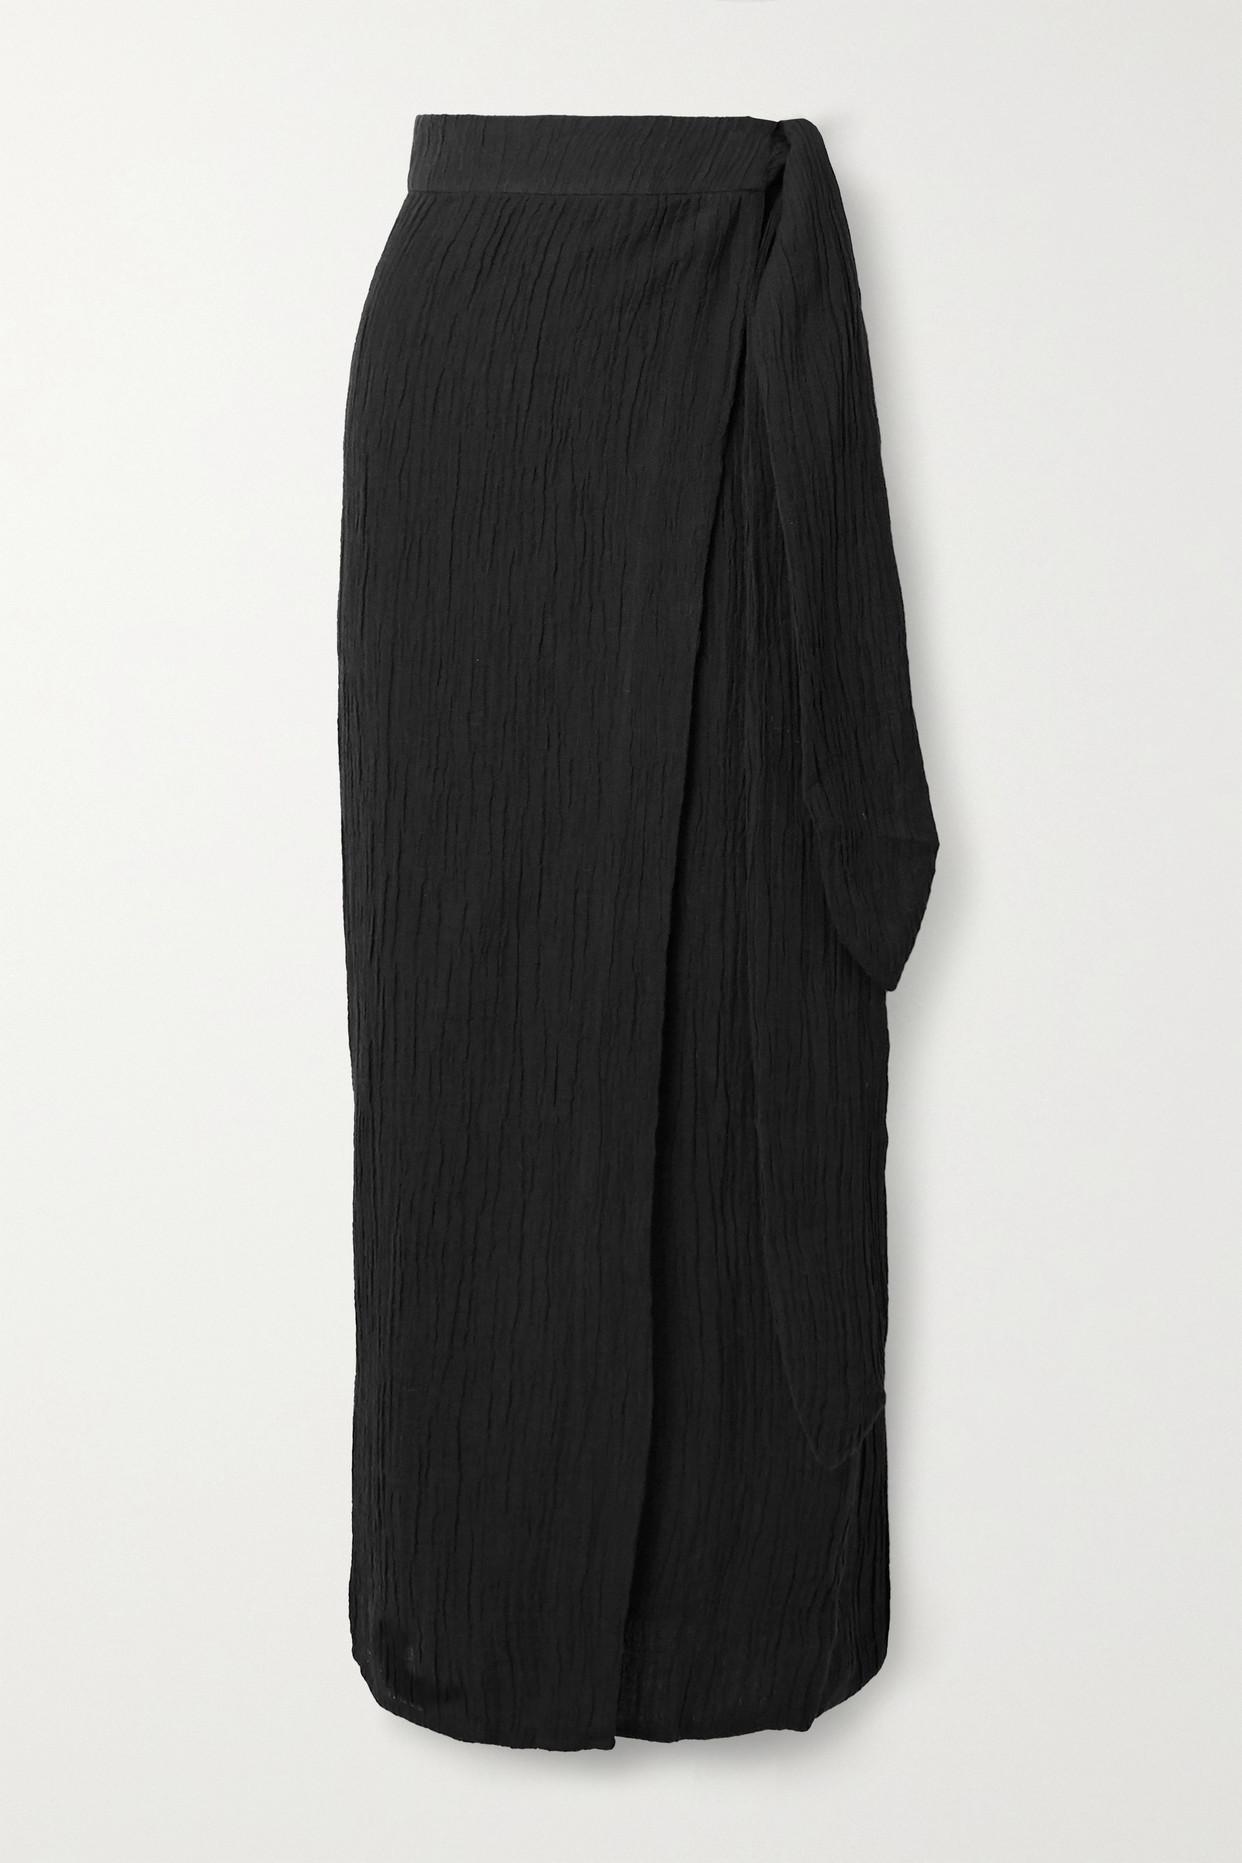 MARA HOFFMAN - + Net Sustain Thiago Crinkled Organic Linen And Cotton-blend Wrap Skirt - Black - x s